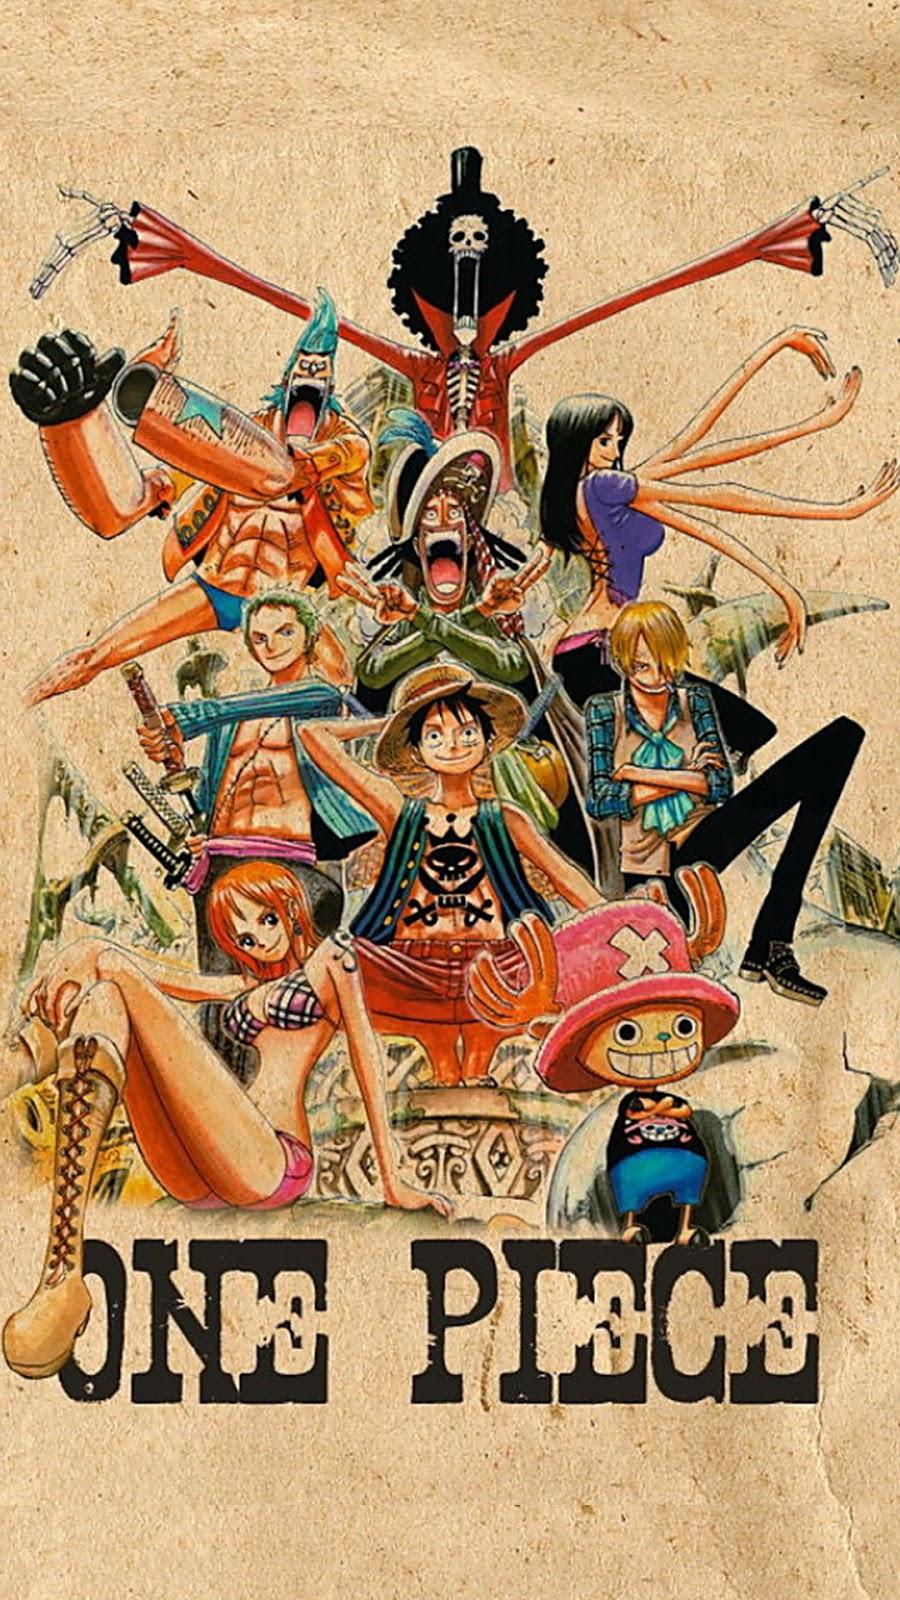 18 Wallpaper One Piece Android Kualitas Hd Terbaru Grafis Media